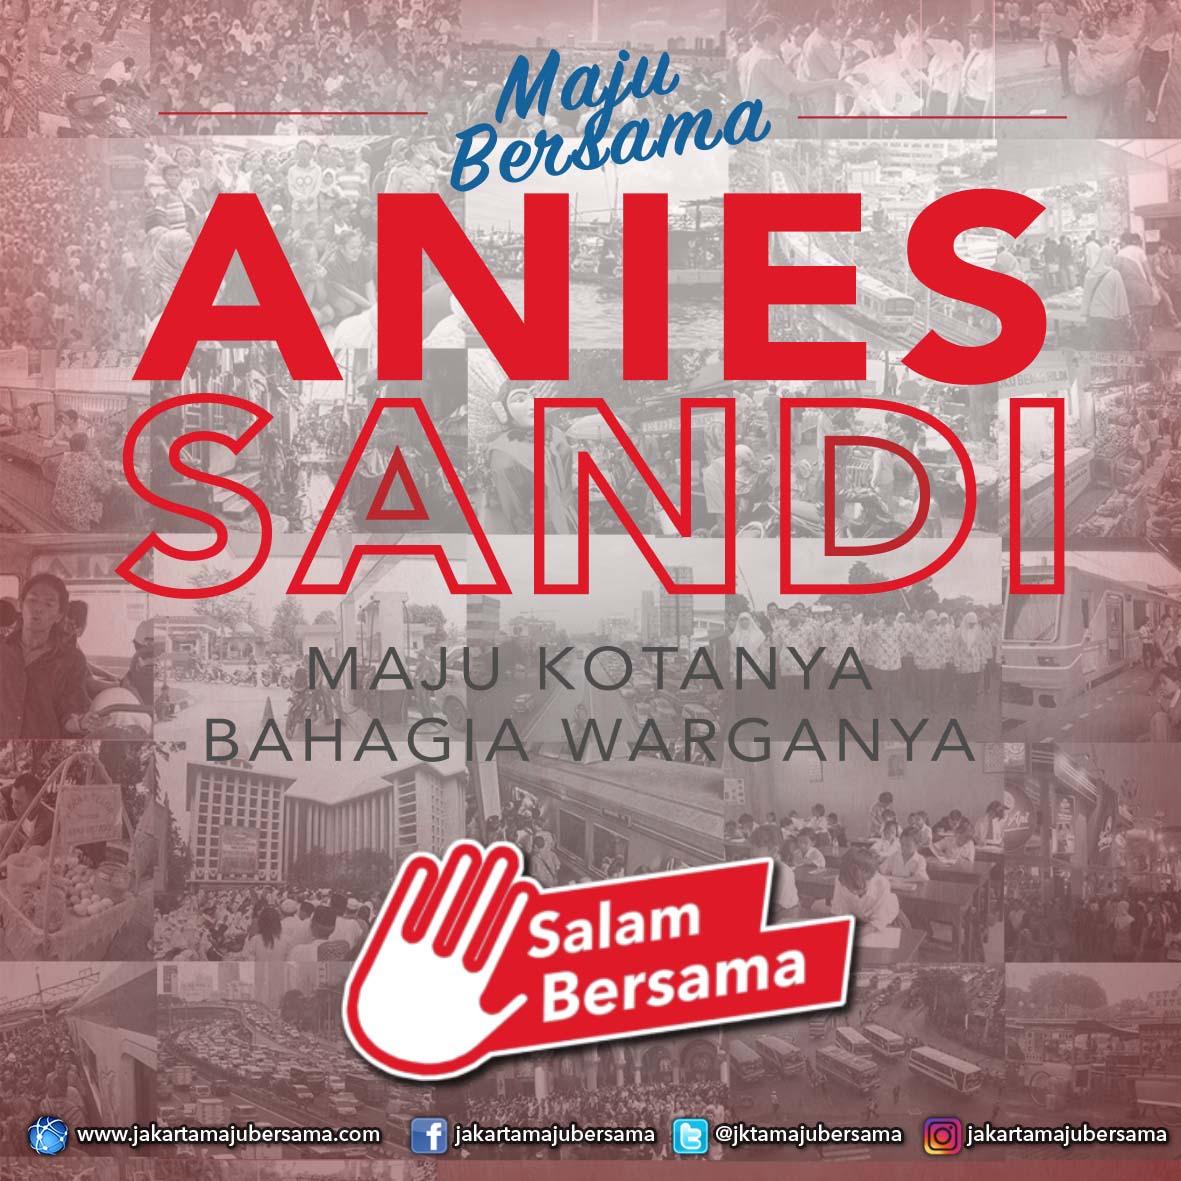 Anies Sandi Luncurkan Logo Resmi Untuk Pilgub DKI Ini Maknanya